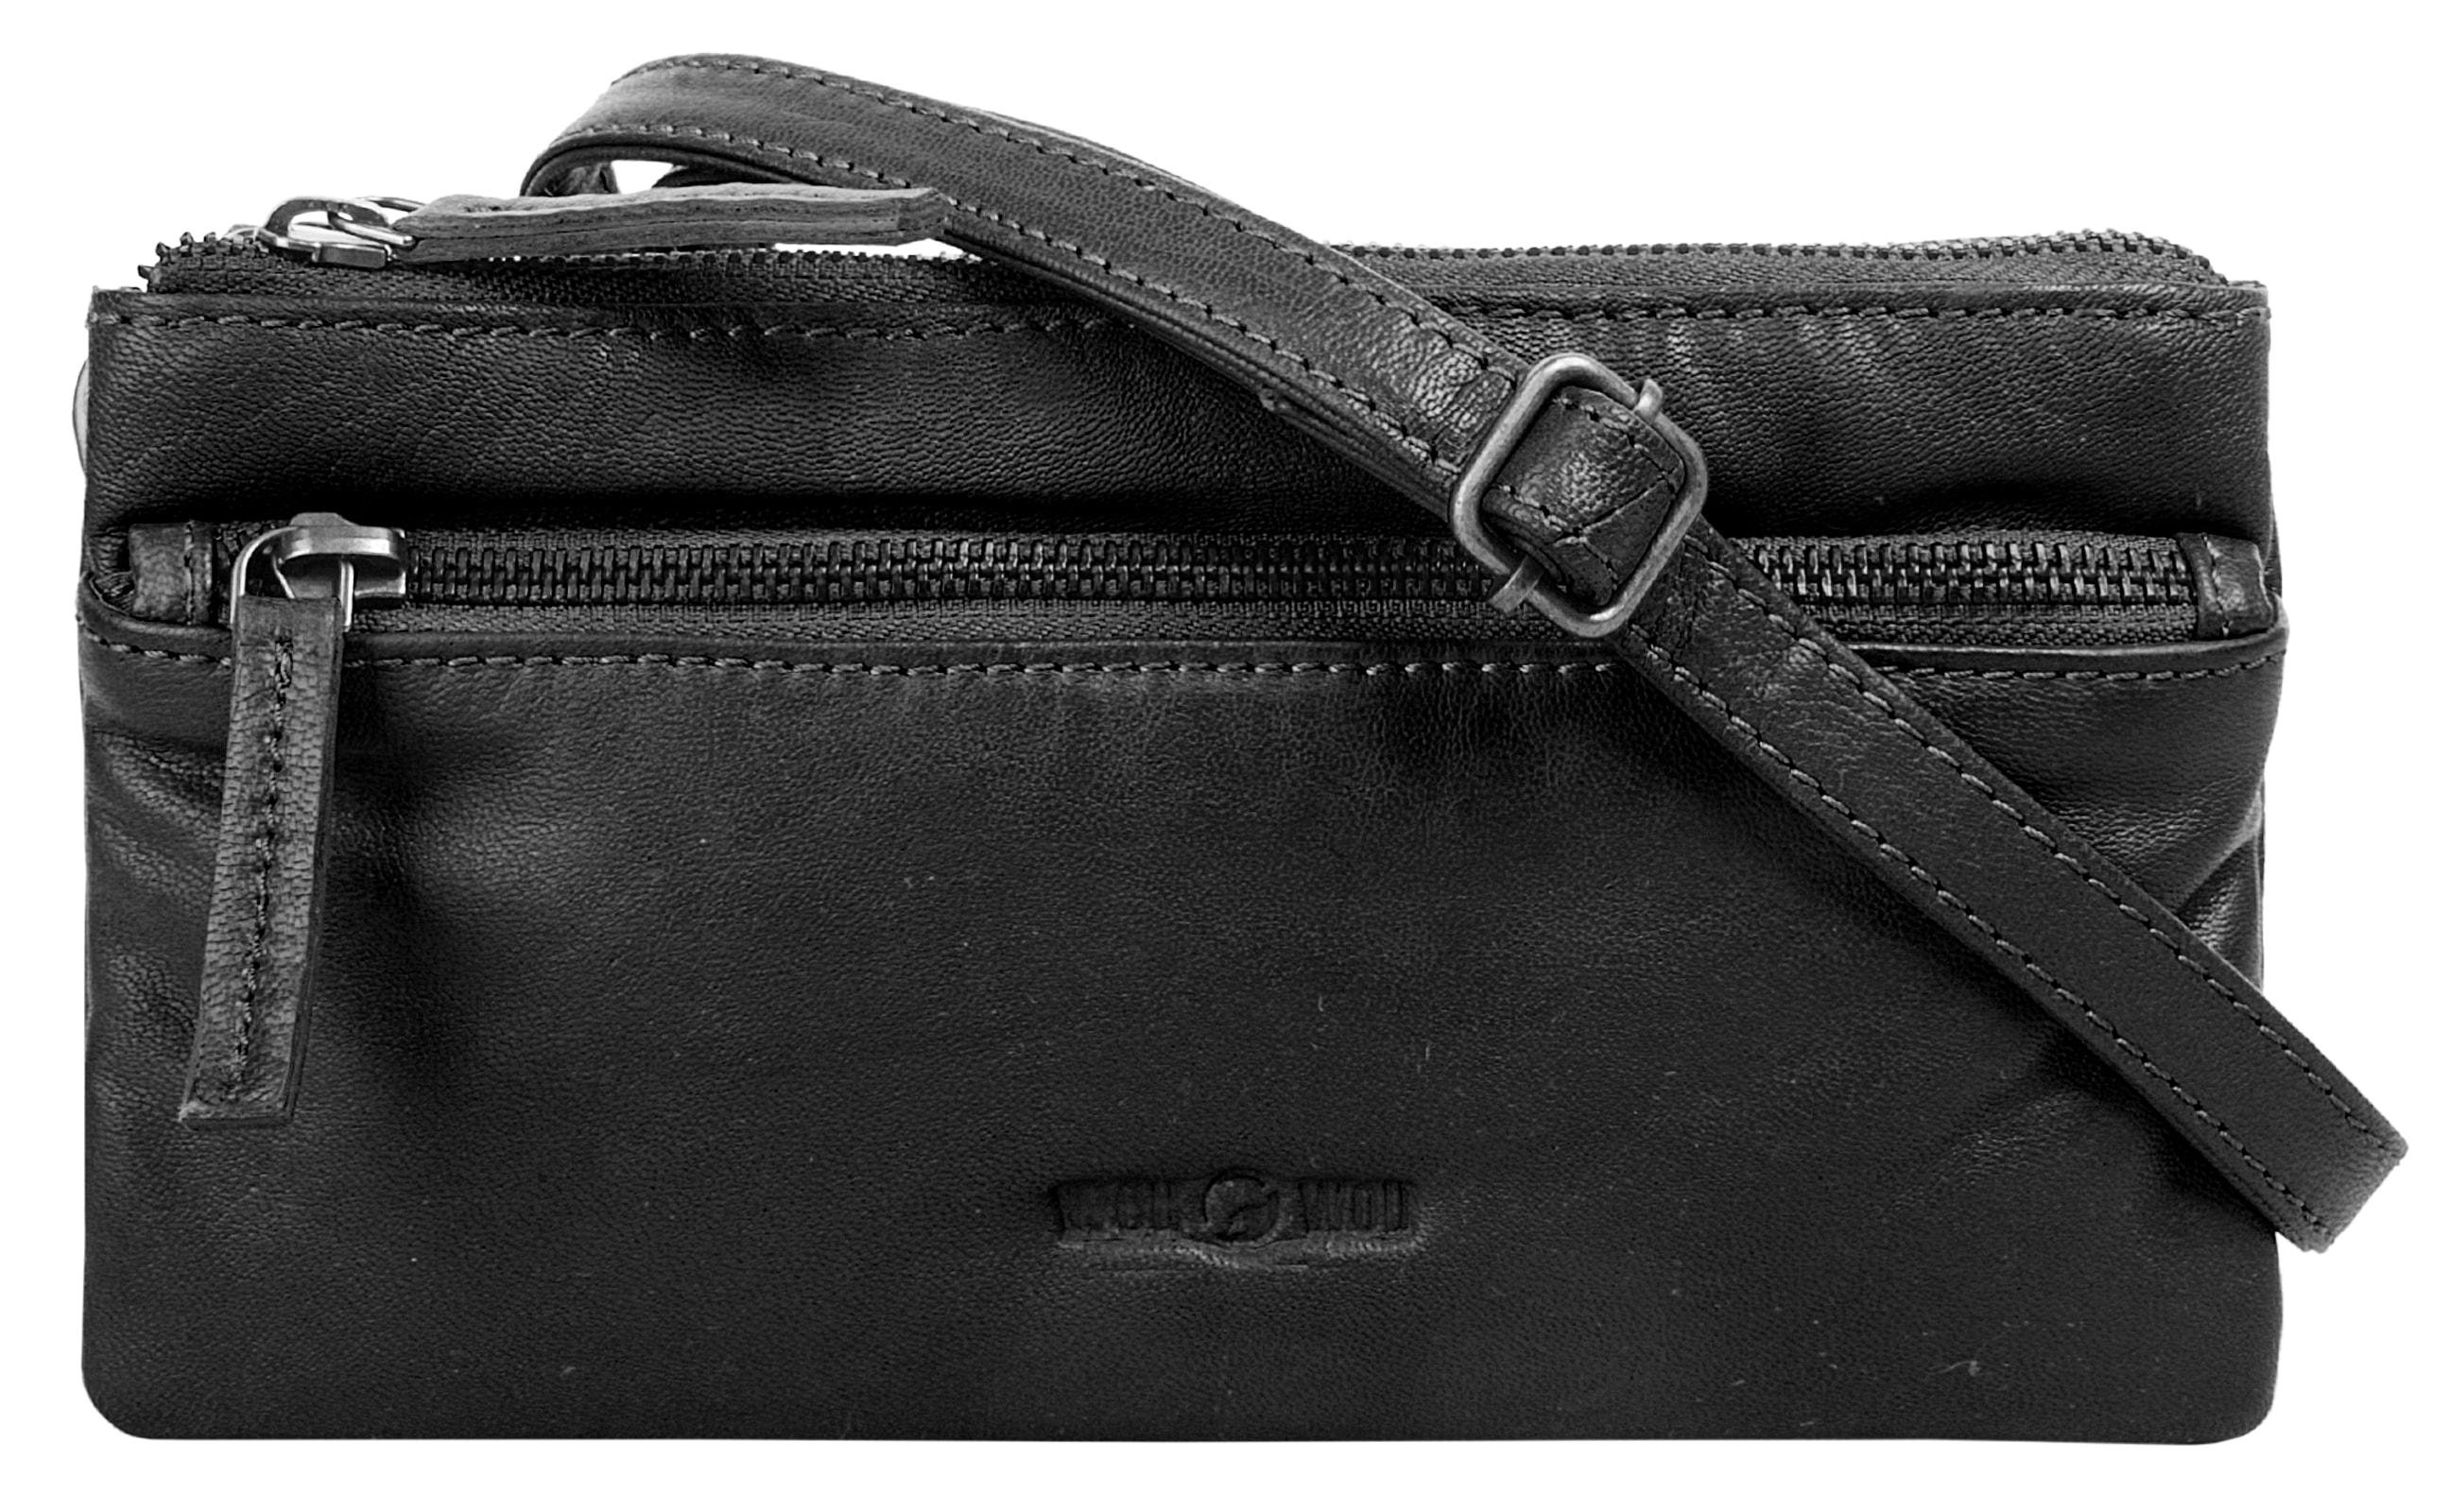 WouWou Abendtasche | Taschen > Handtaschen > Abendtaschen | Wouwou